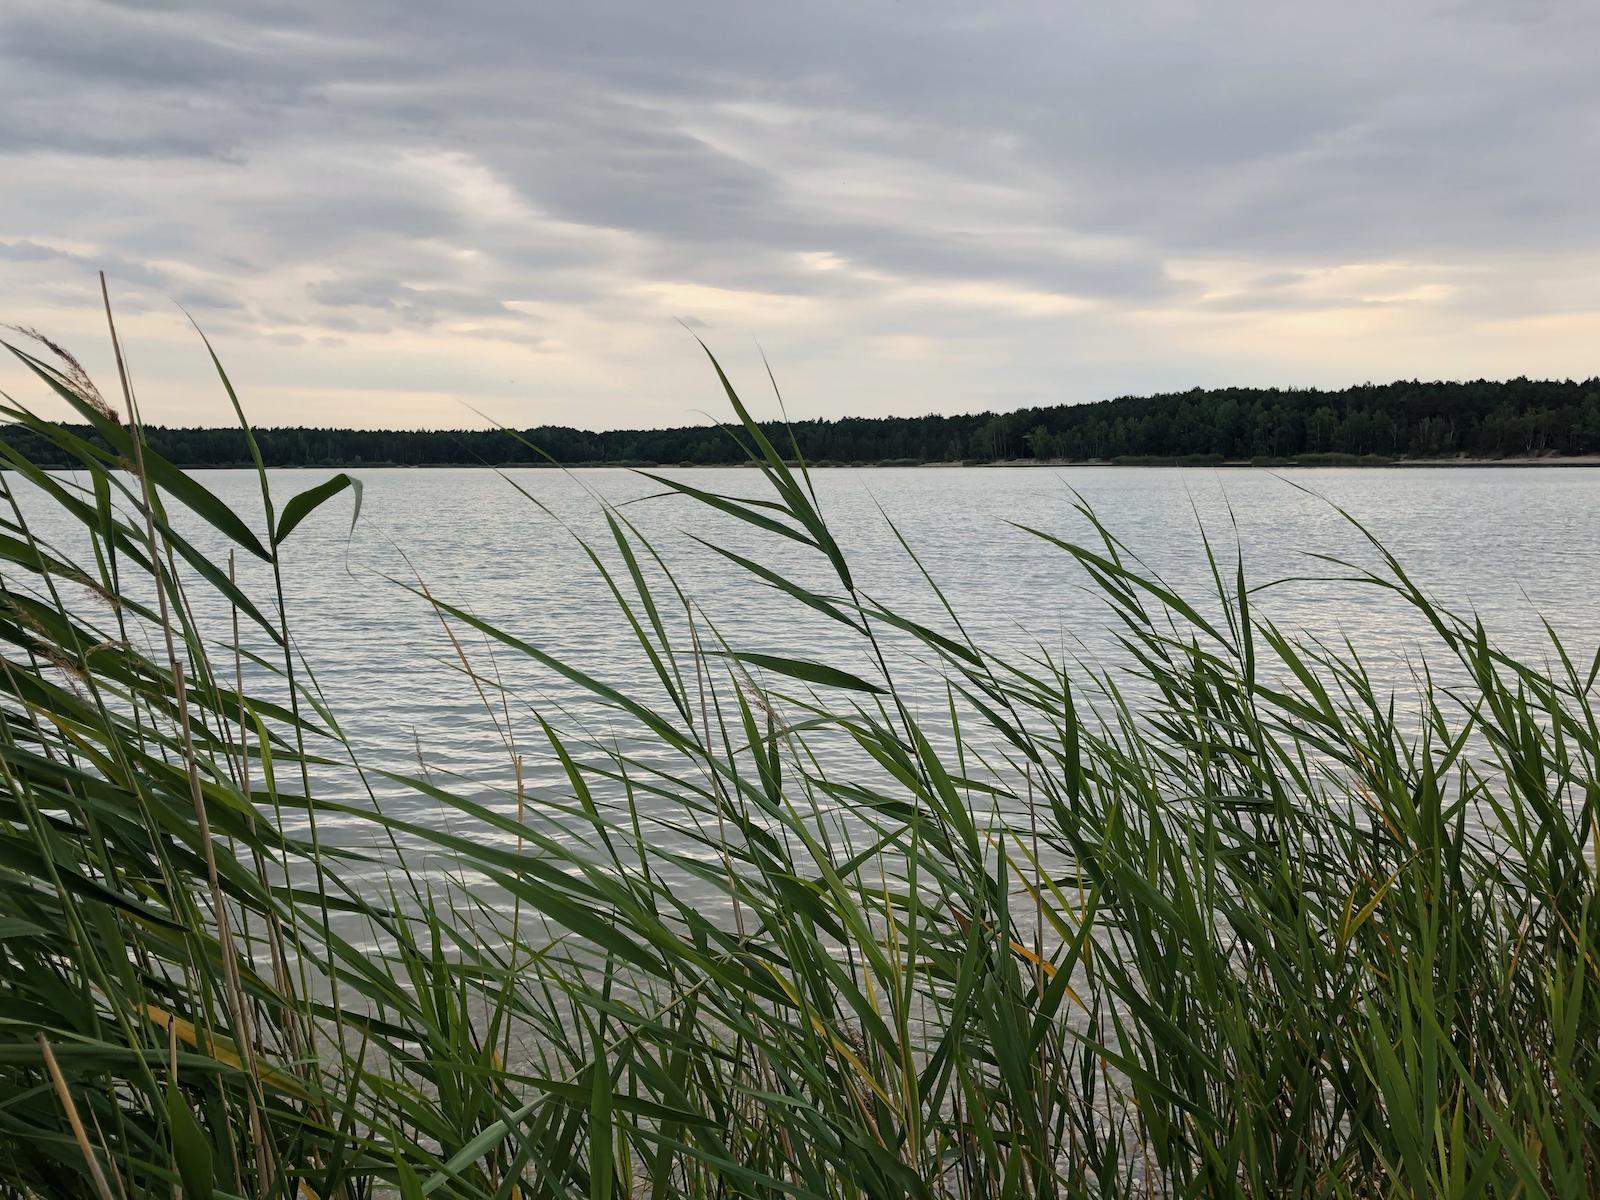 Letzter Abend am Naunhofer See